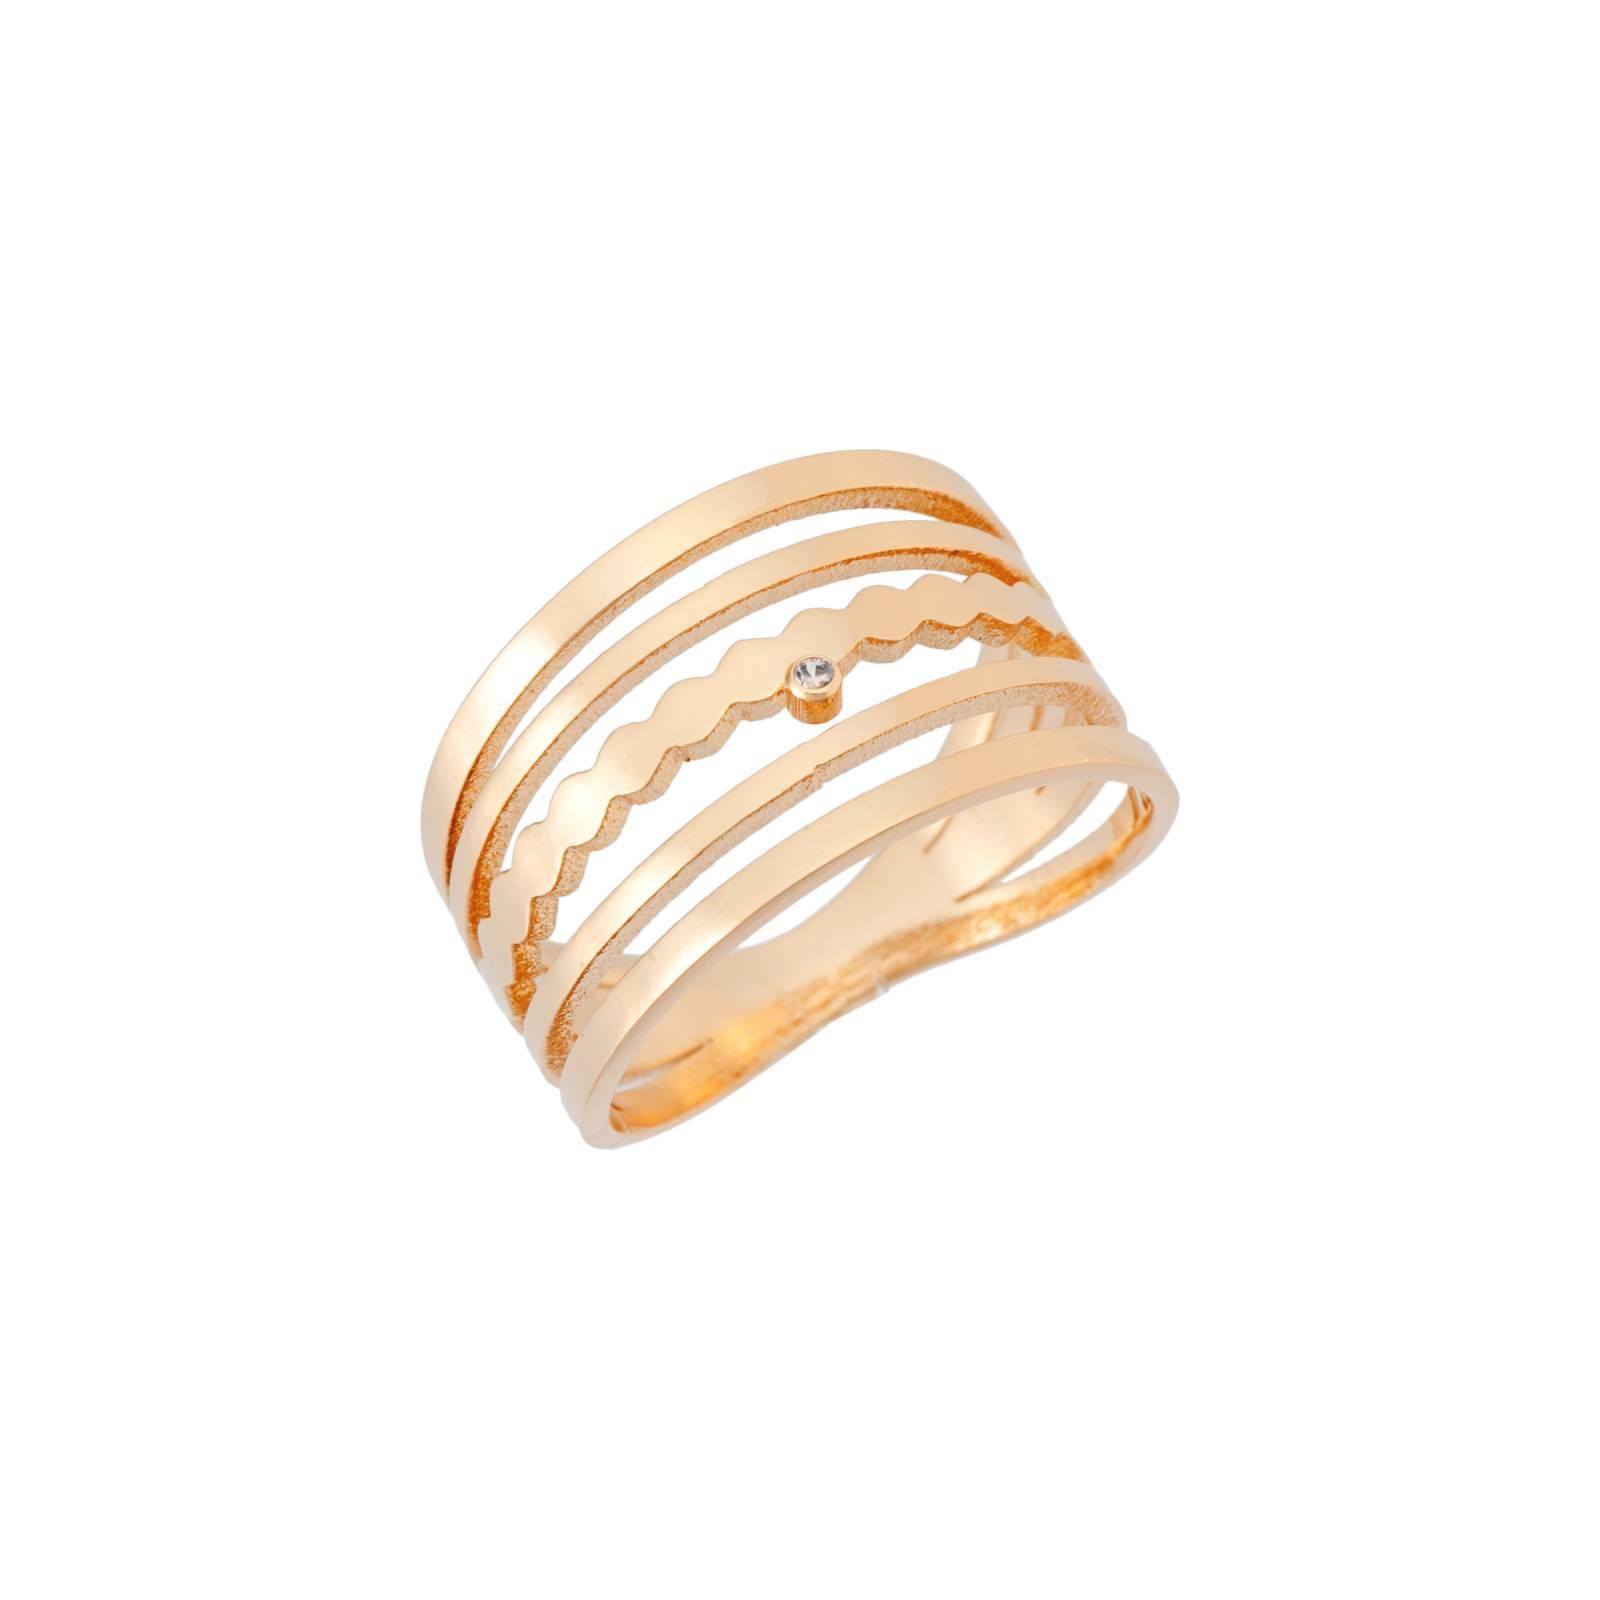 Anel semijoia Zircônia design vazado banhado a ouro